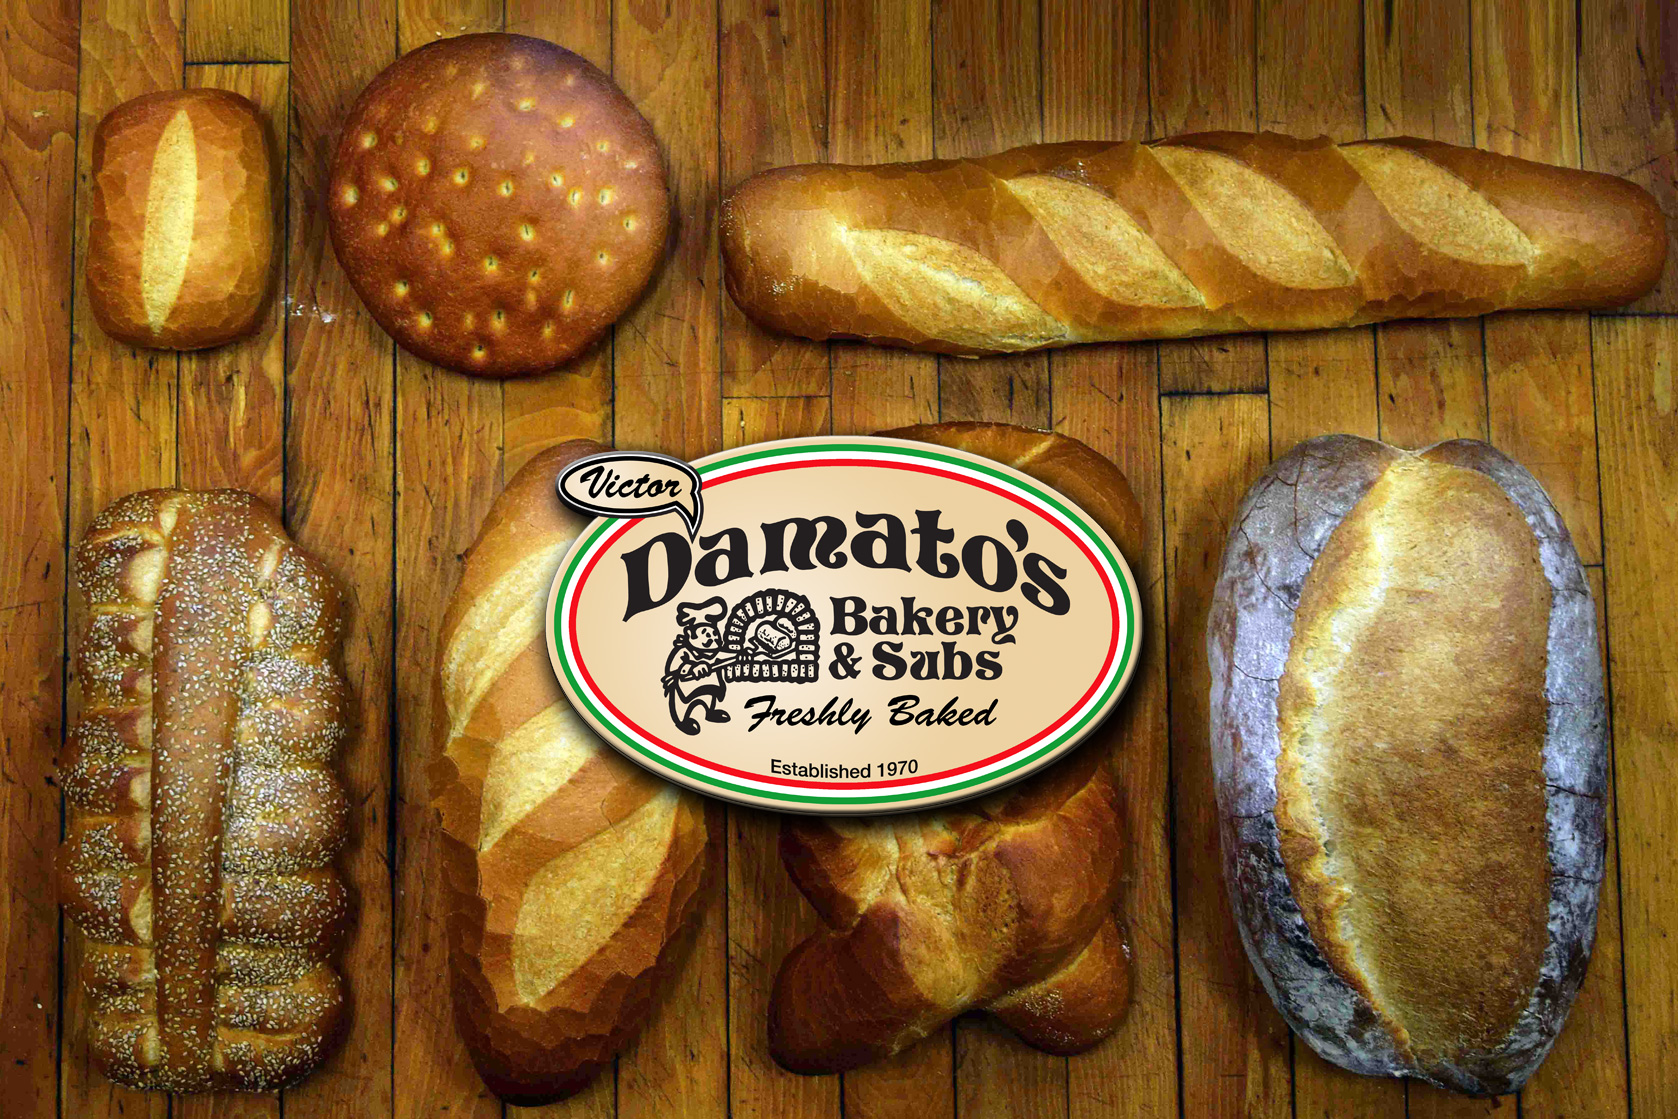 D'Amato's Chicago Breads